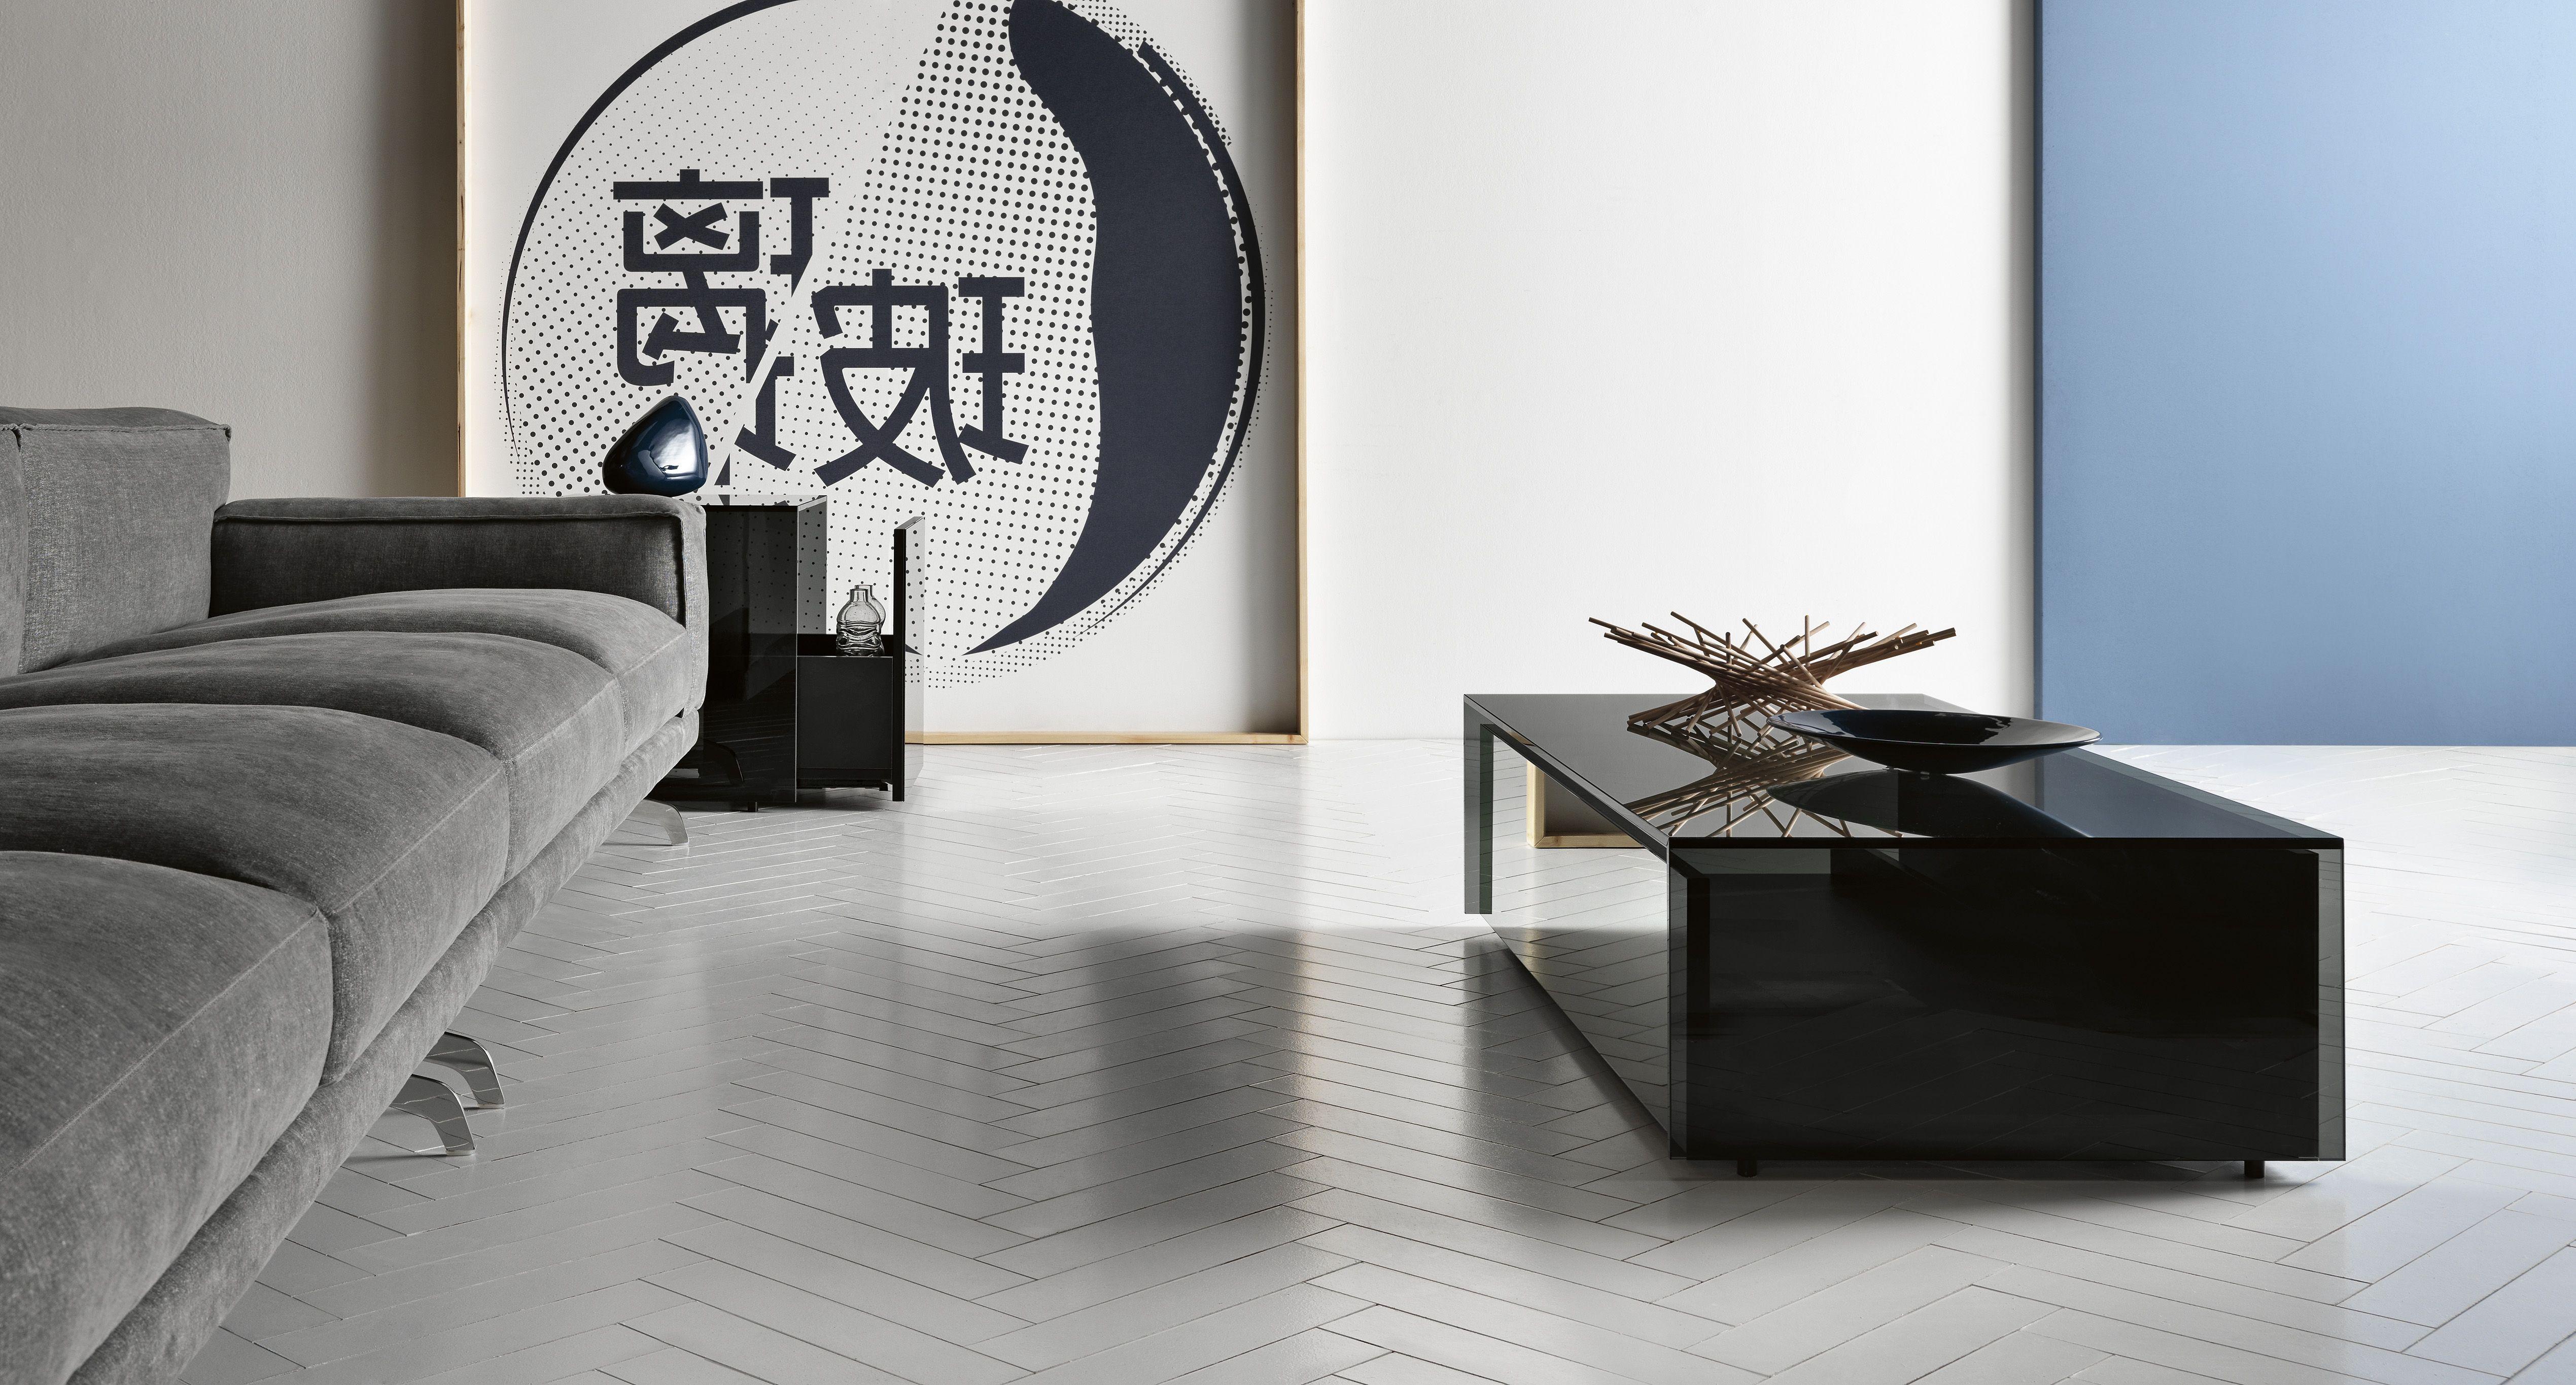 GOTHAM design Leonardi_Marinelli for Tonelli design. Smoked glass ... - GOTHAM design Leonardi_Marinelli for Tonelli design. Smoked glass low table  with drawer.